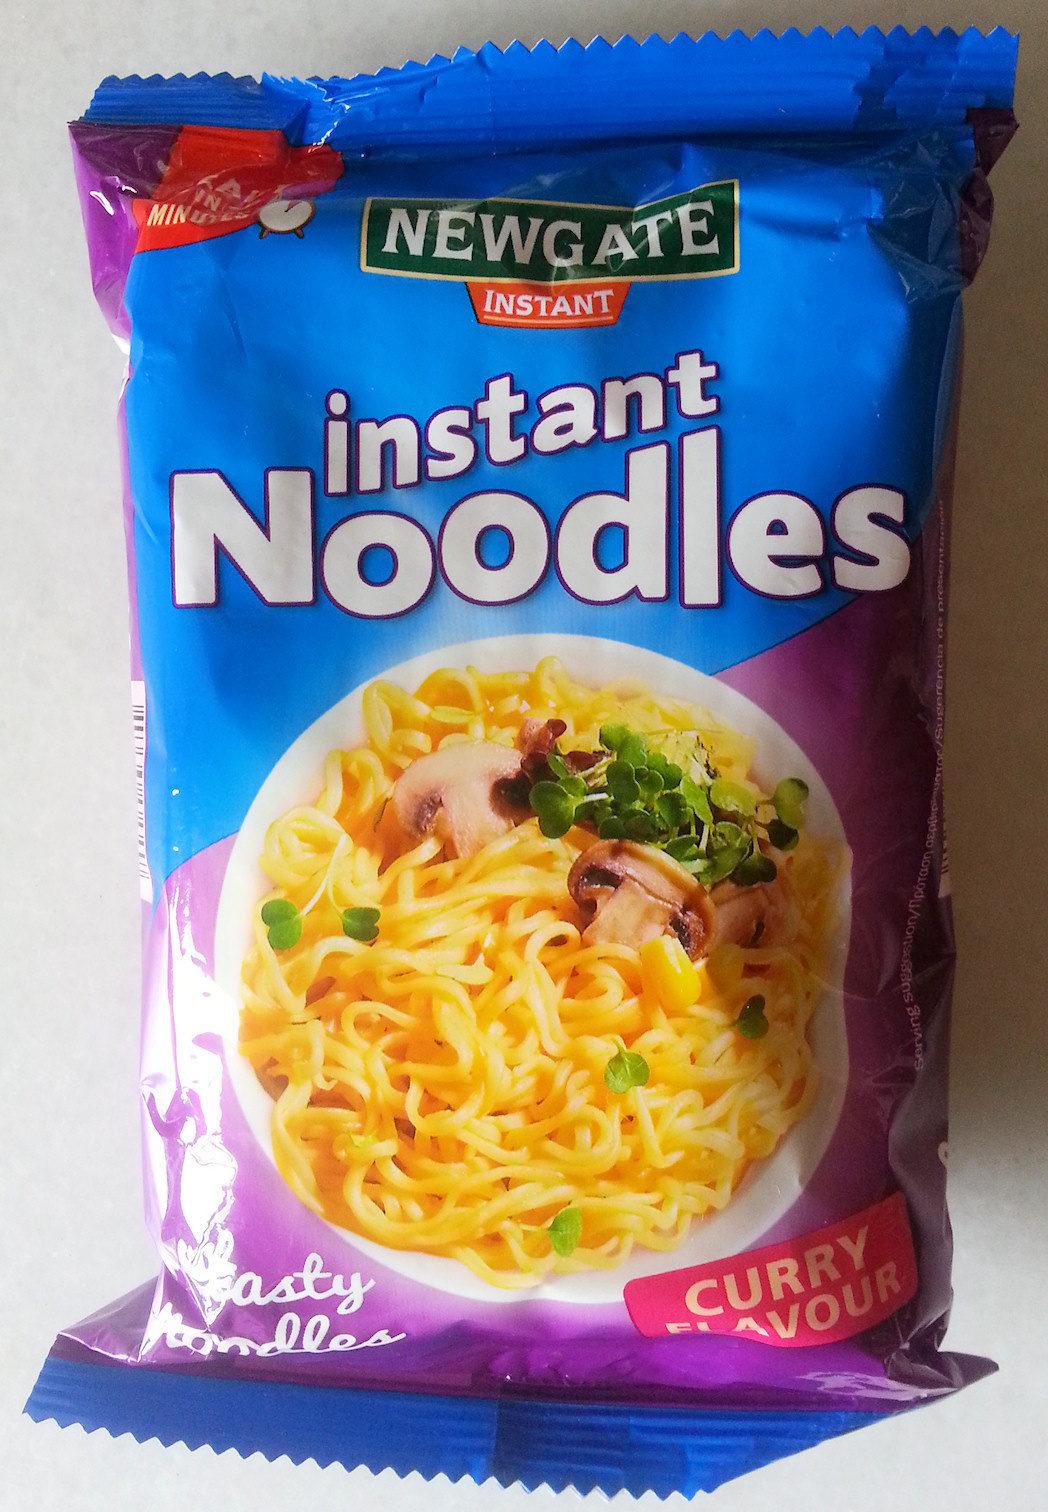 Instant Noodles Curry Flavour - Producto